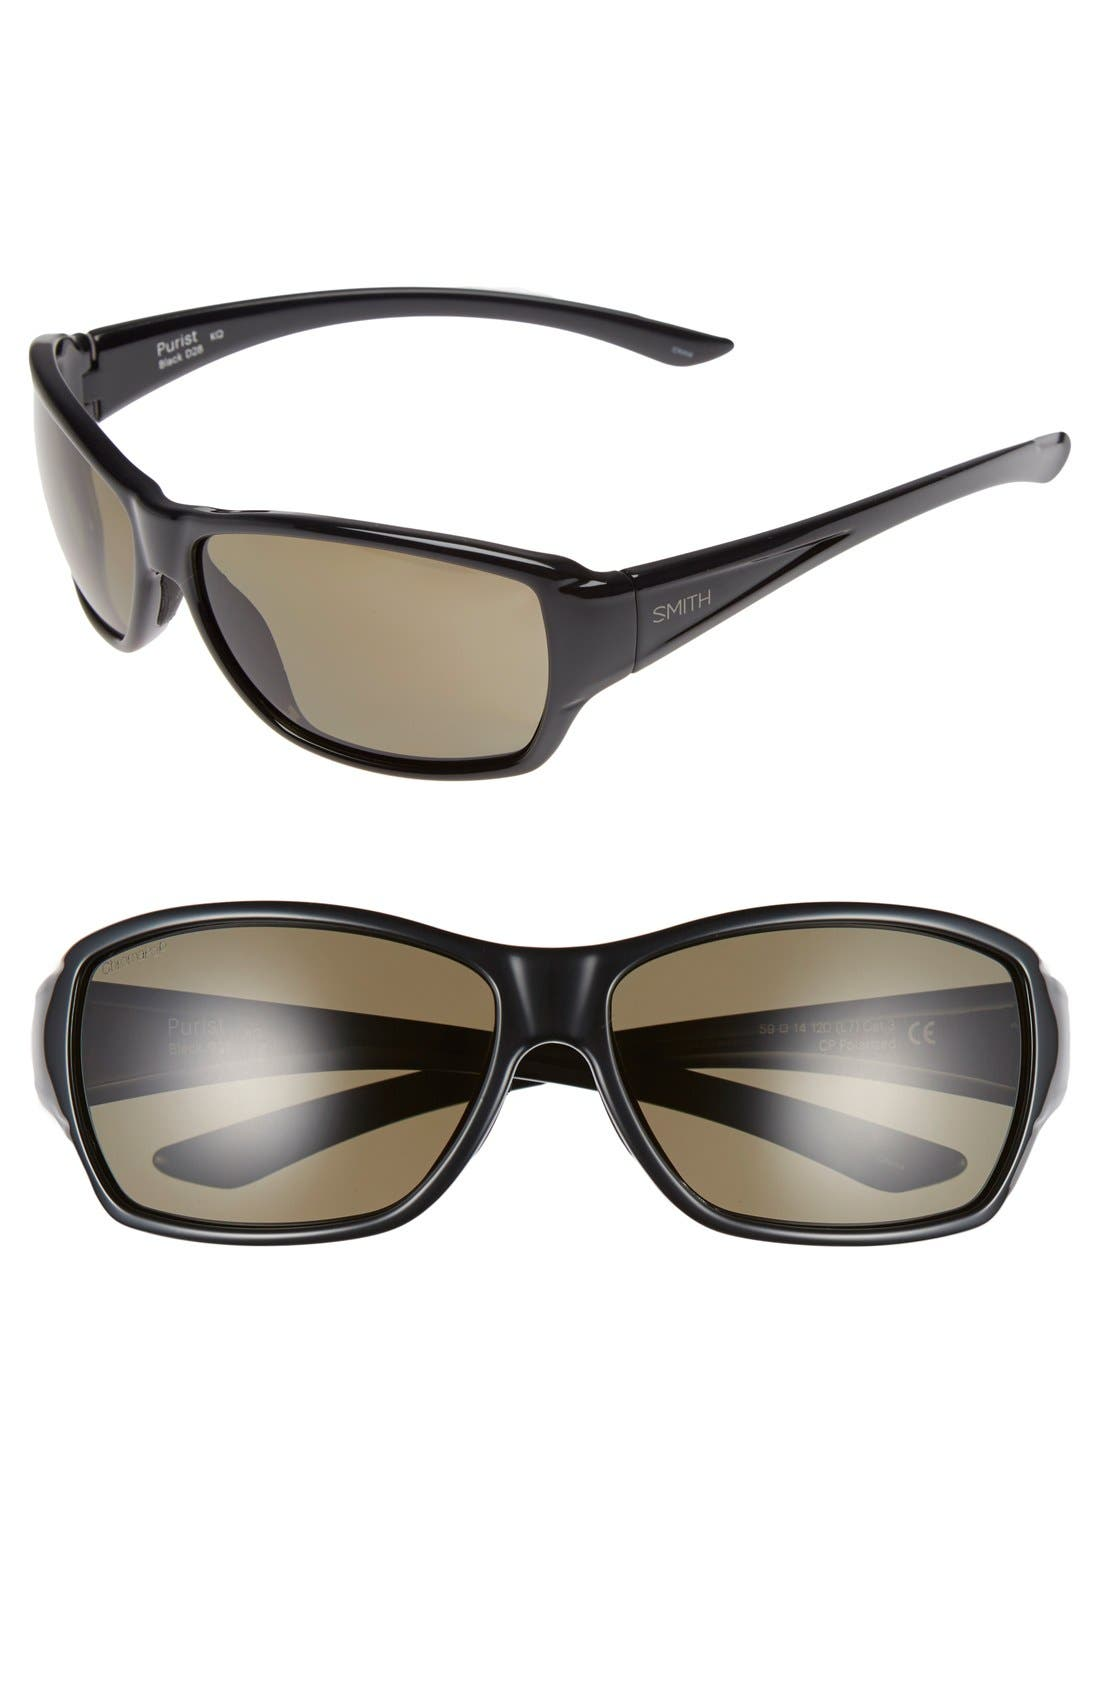 Main Image - Smith 'Purist' 59mm Polarized Sunglasses